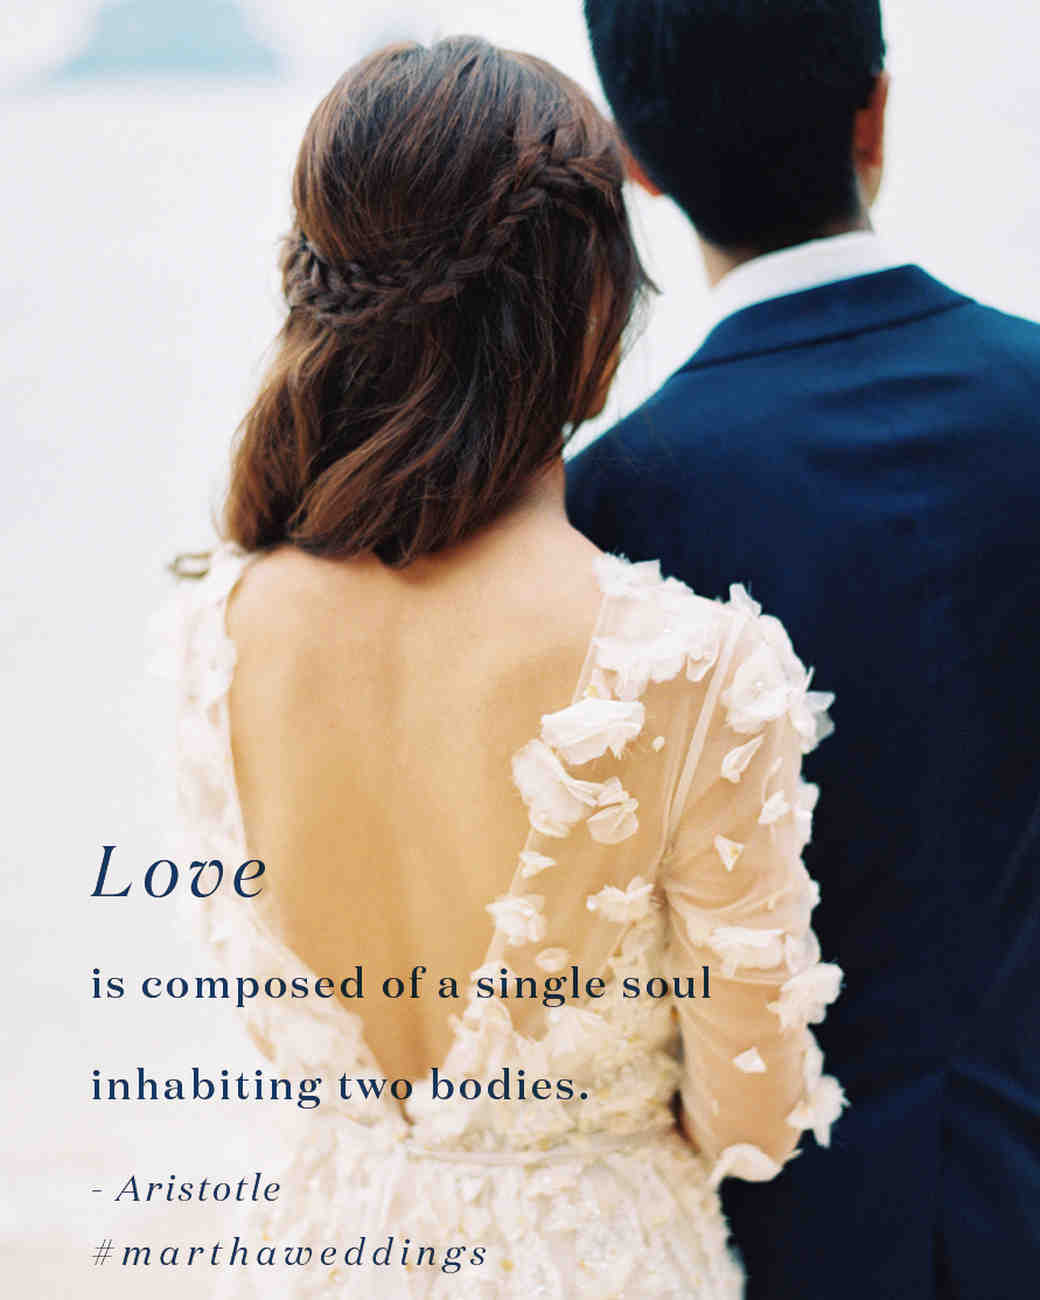 love-quotes-aristotle-1015.jpg